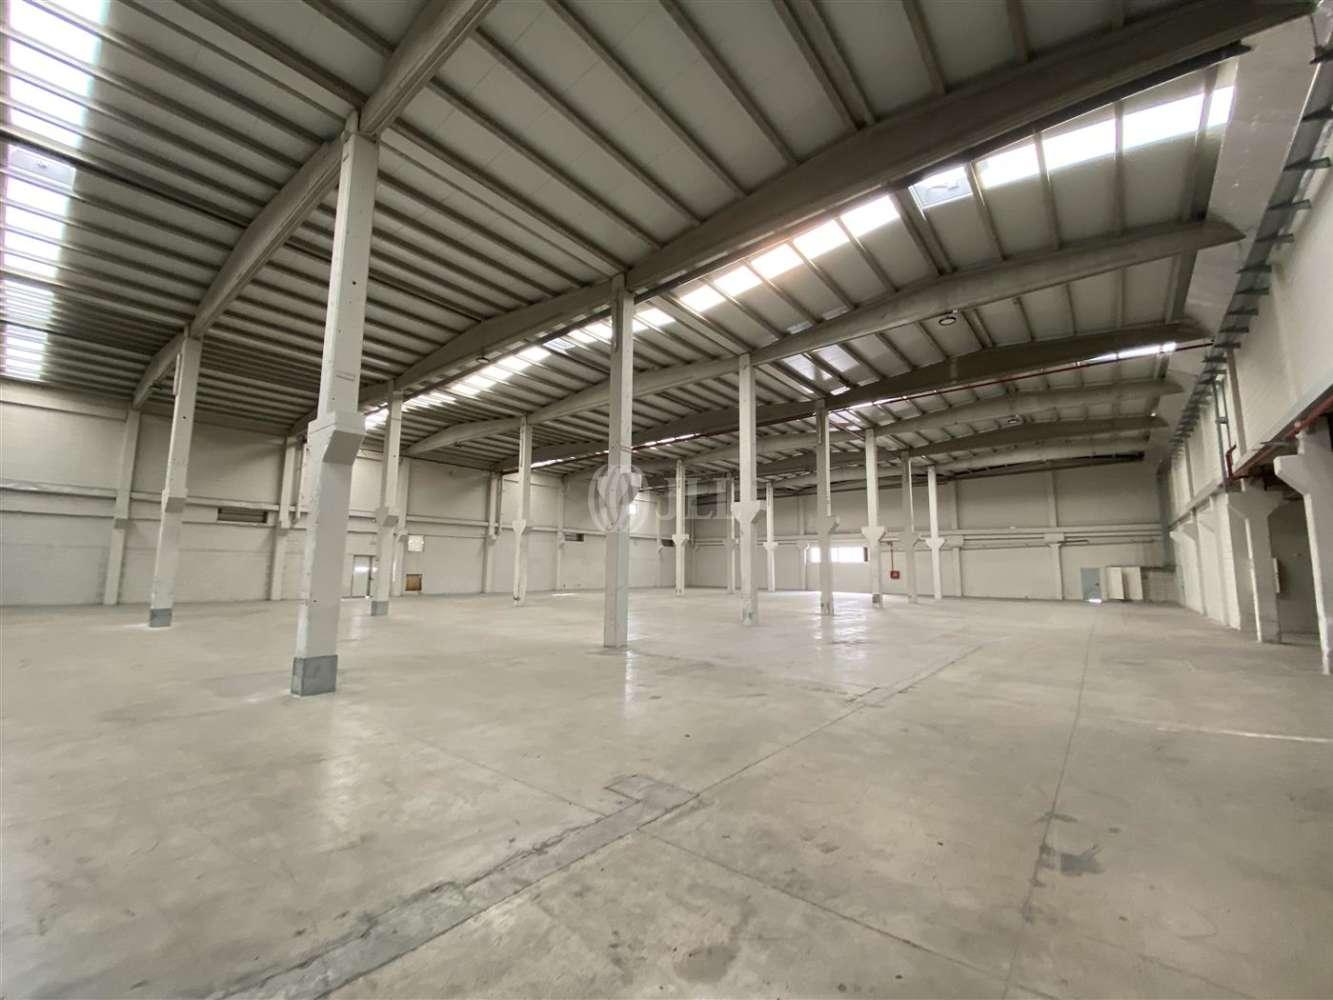 Naves industriales y logísticas El prat de llobregat, 08820 - B0405 - PI EL PRATENC